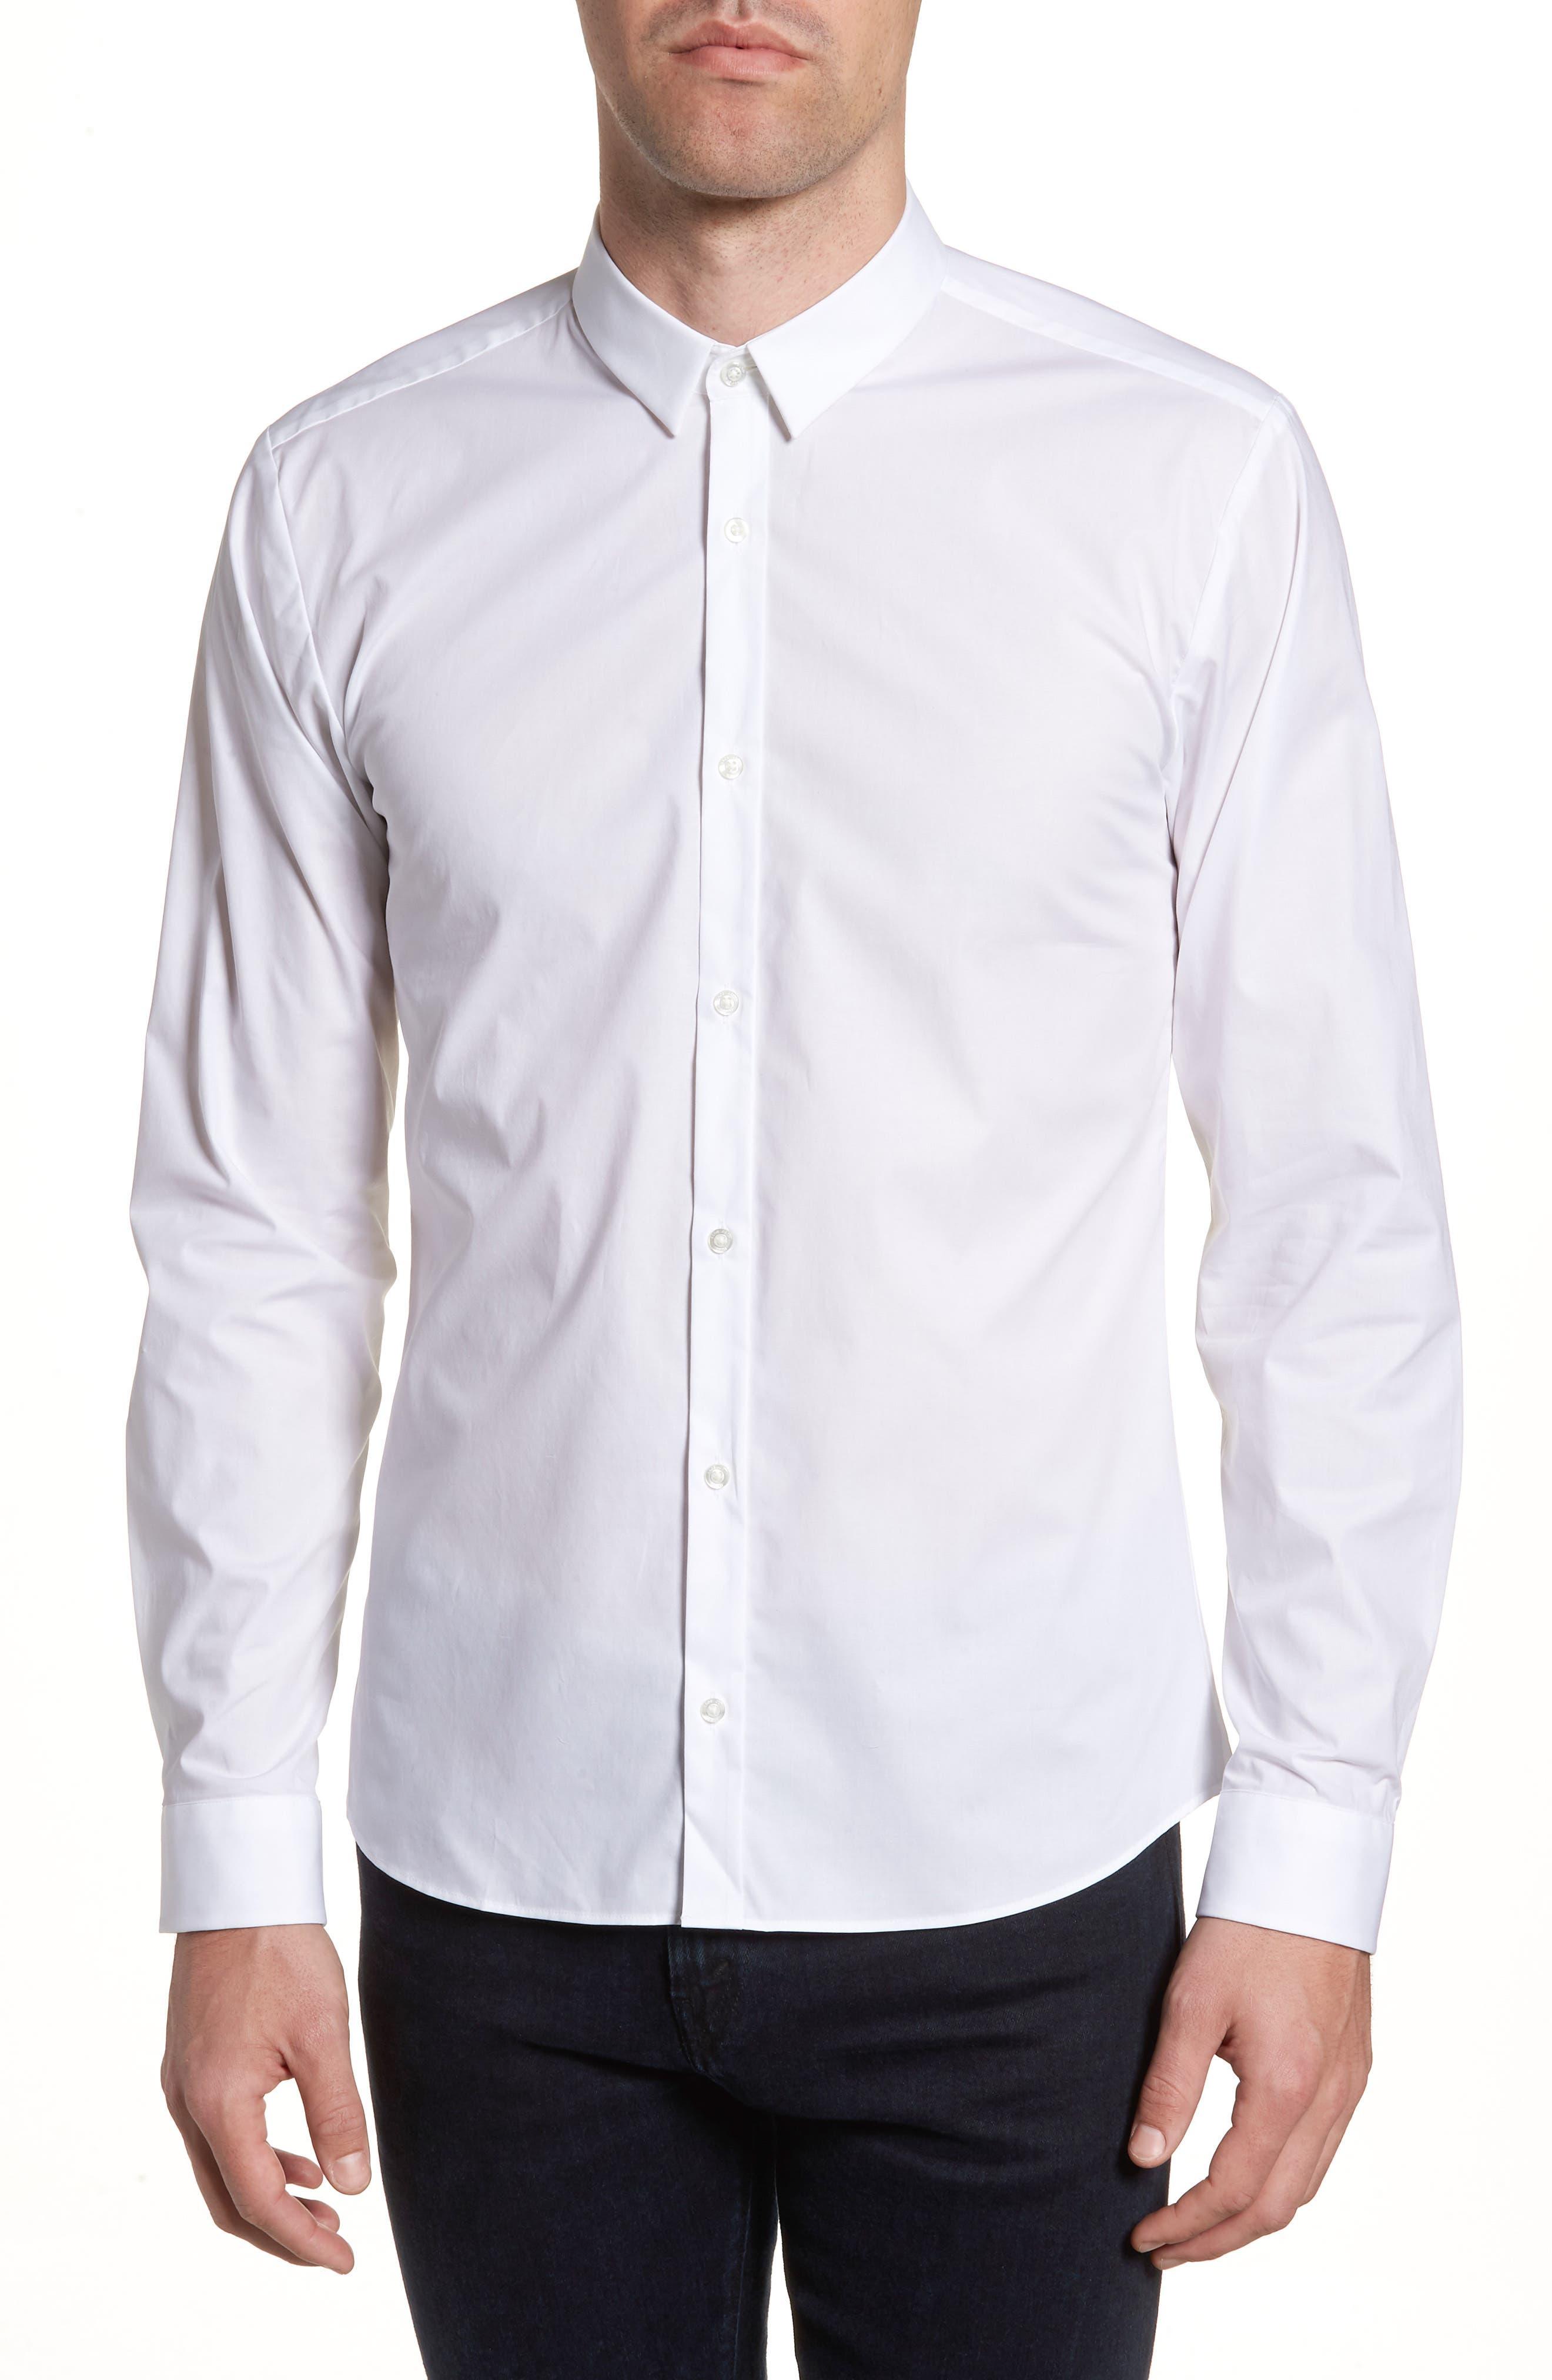 Ero3 Trim Fit Sport Shirt,                             Main thumbnail 1, color,                             White